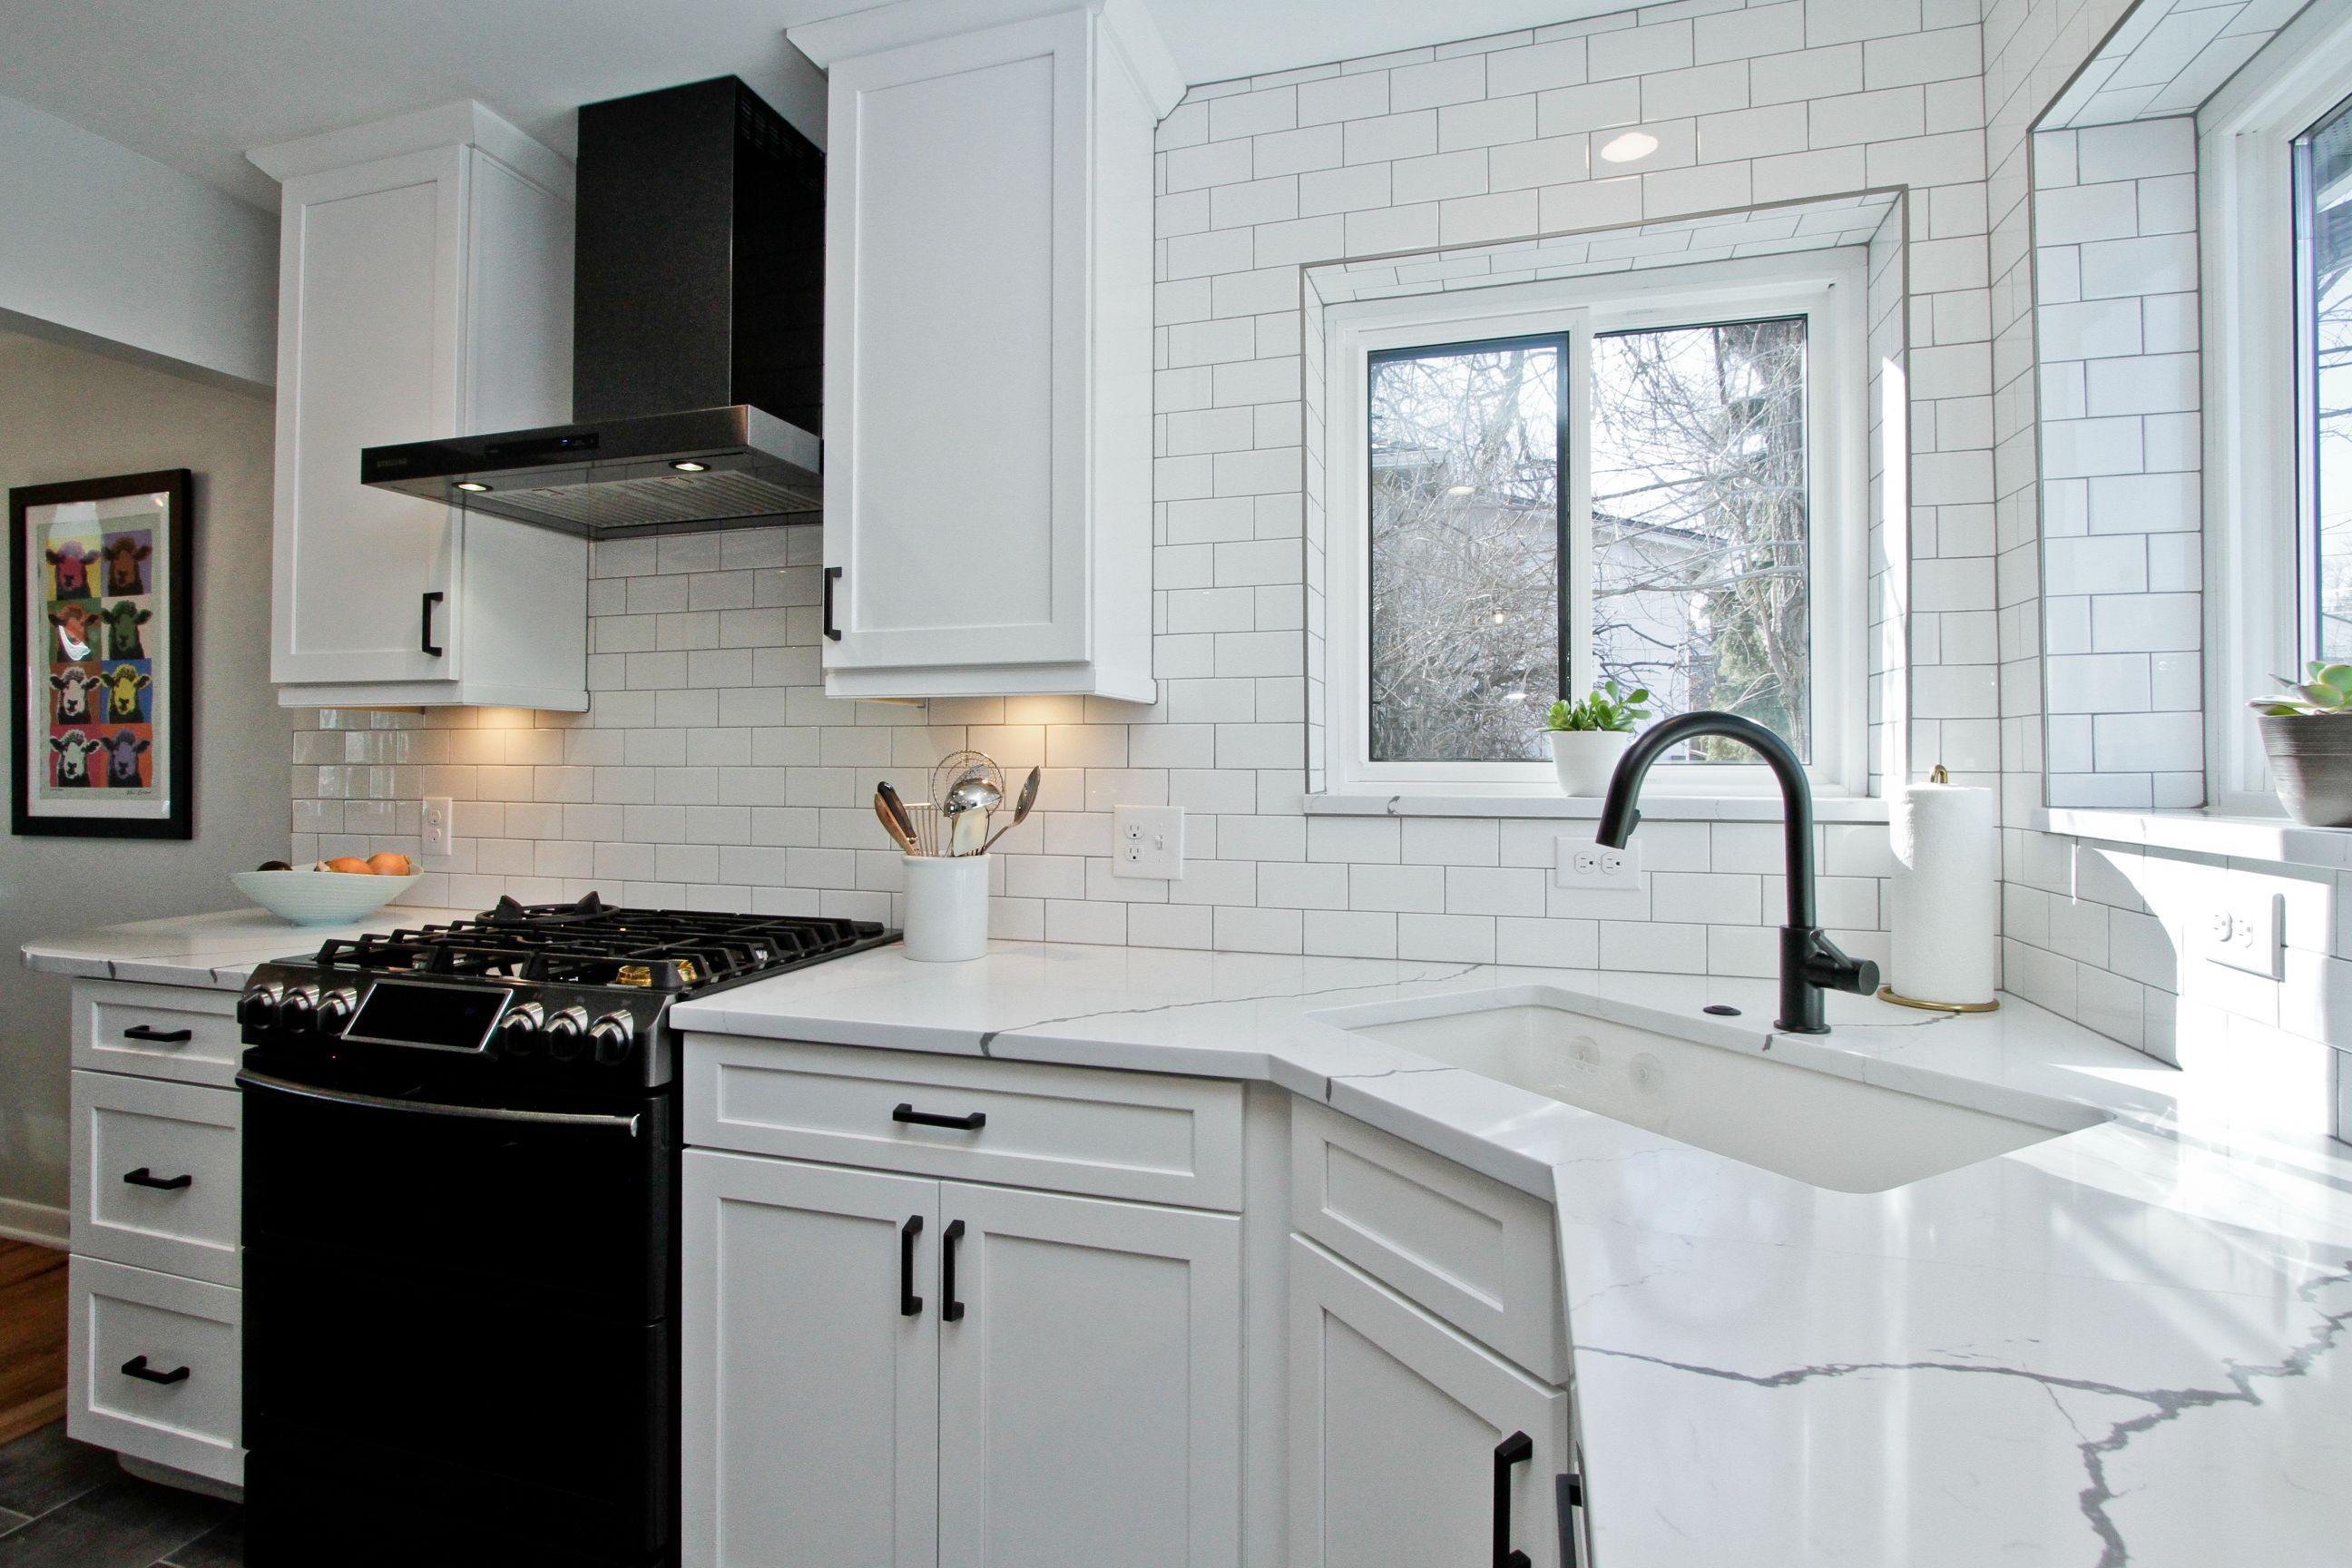 Cress Kitchen & Bath 6770 W 38th Ave Wheat Ridge, CO ...